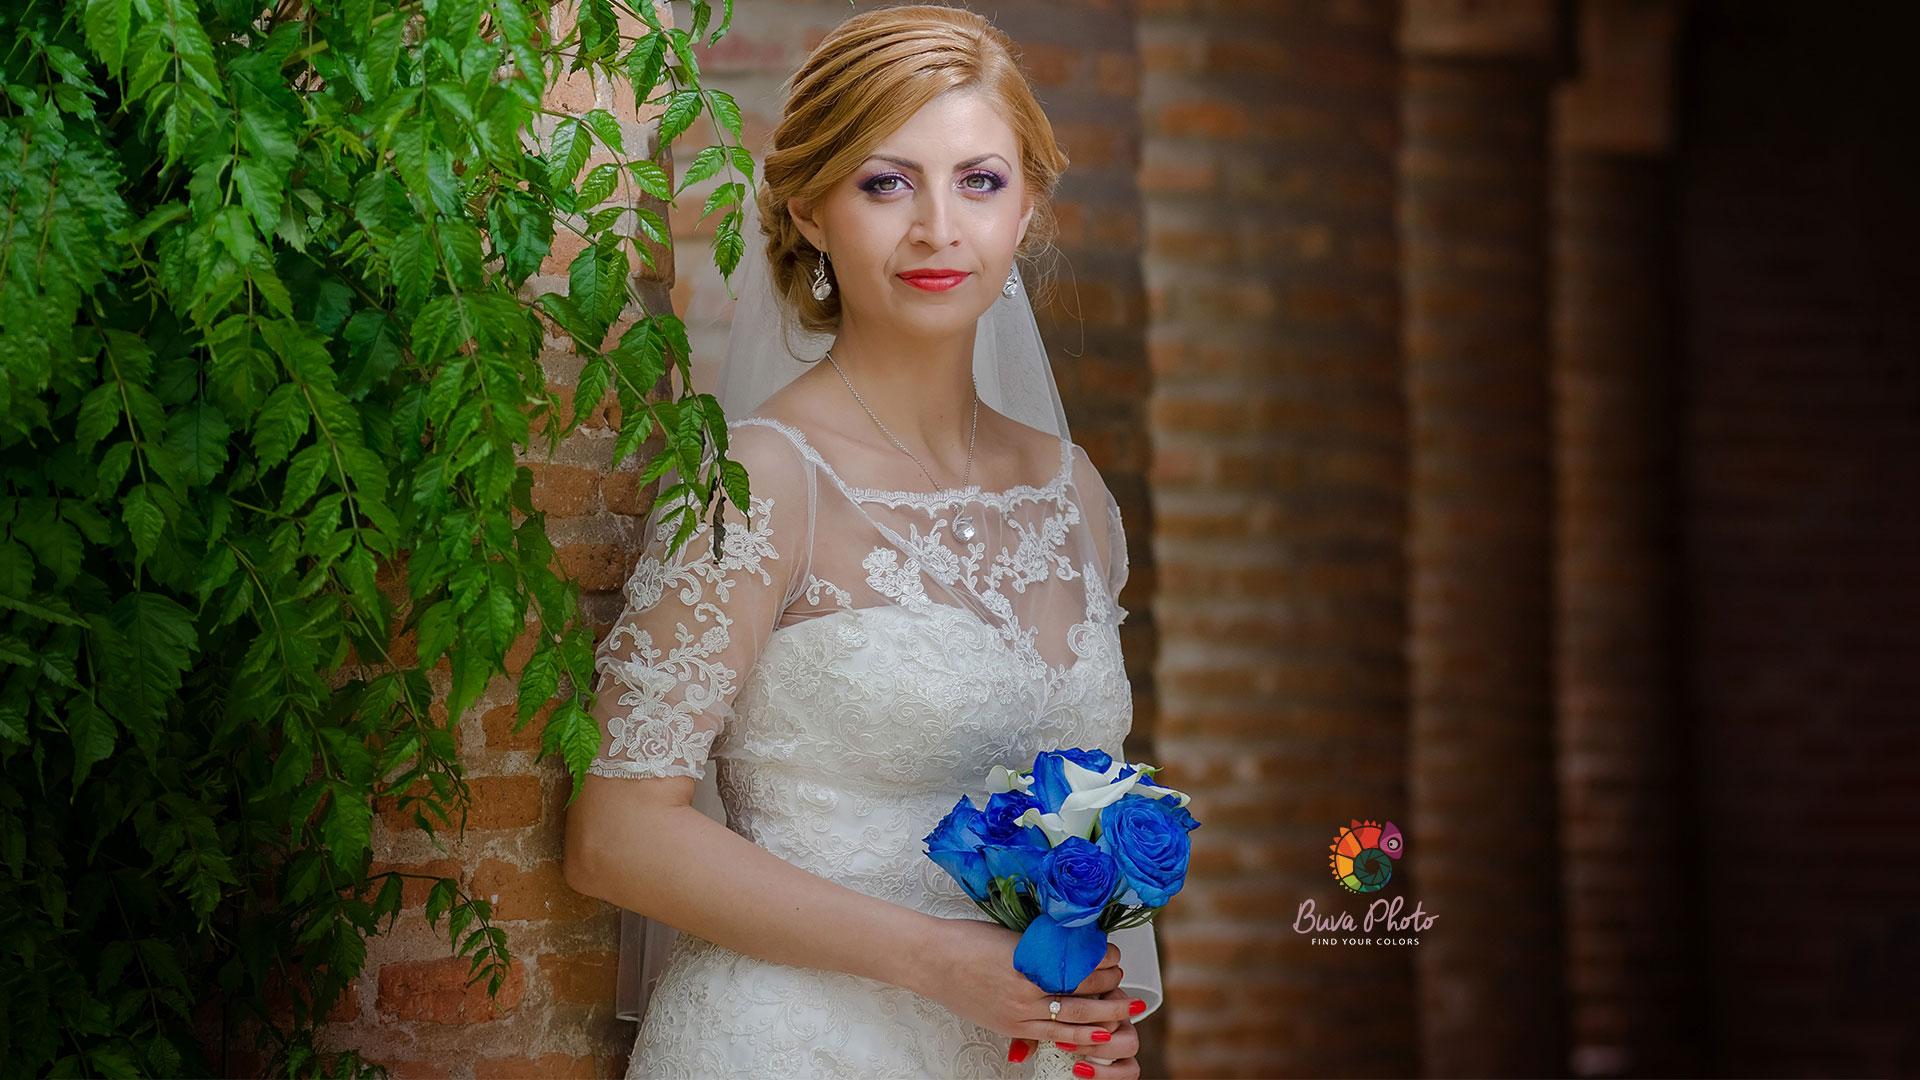 fotografie-nunta-cover-4